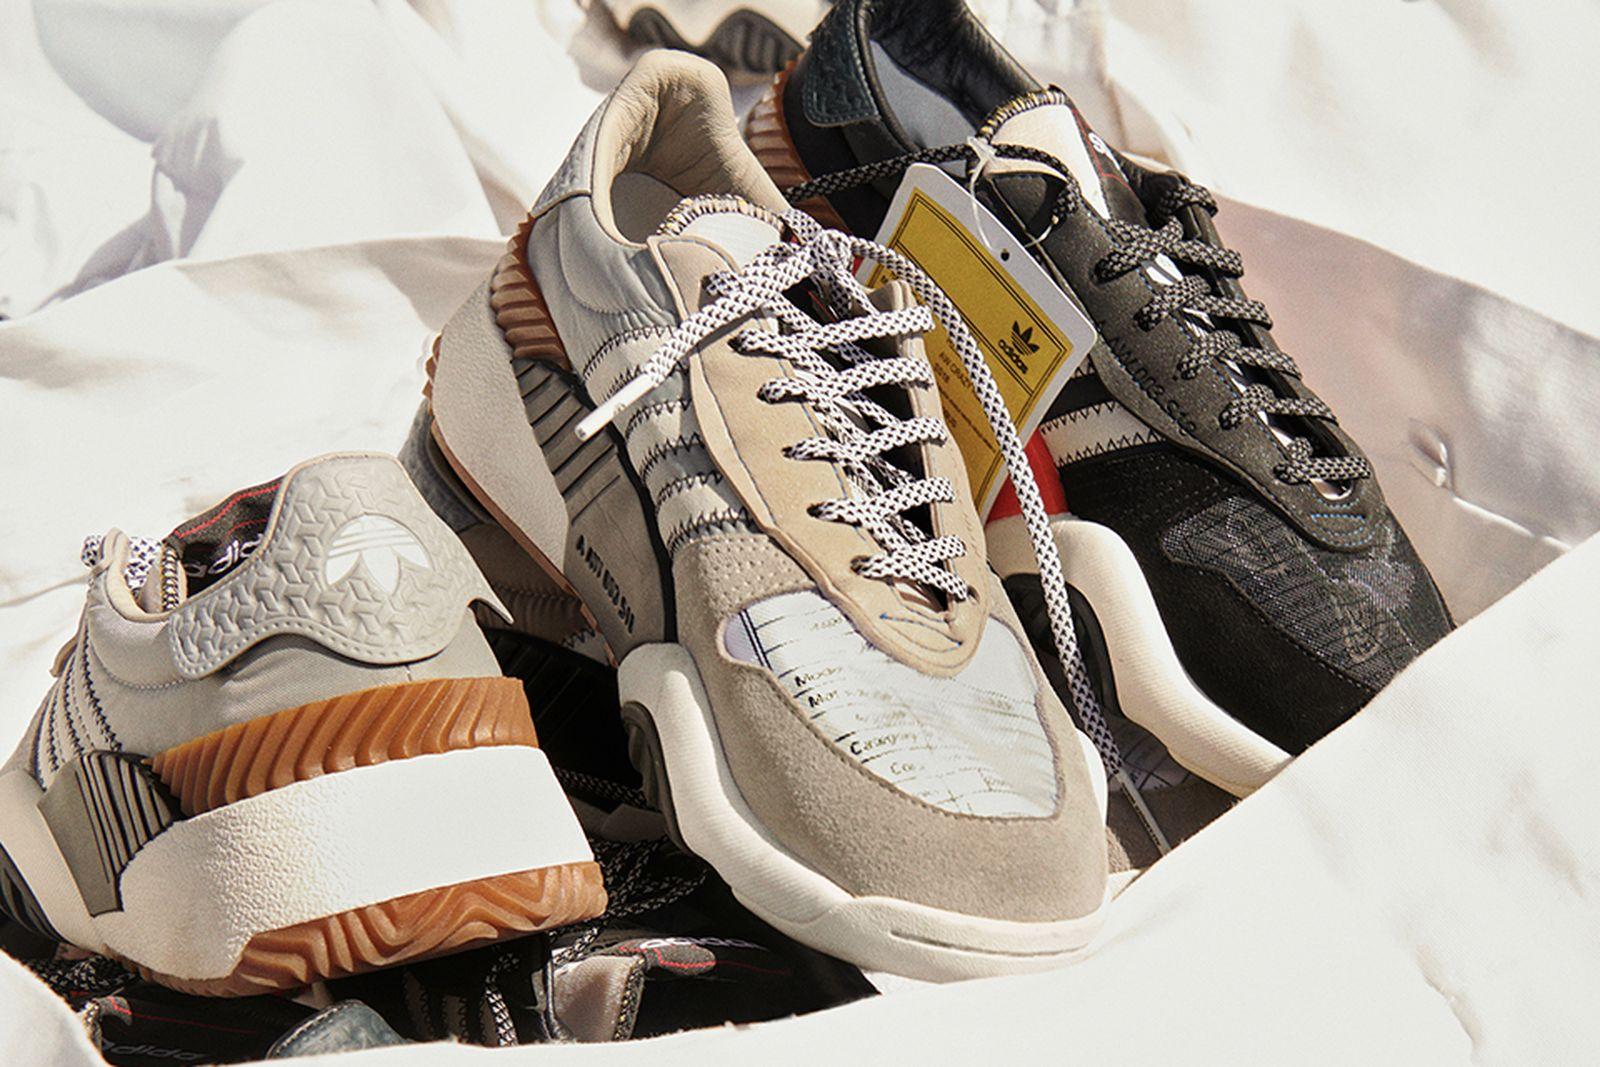 adidas13 adidas originals x alexander wang